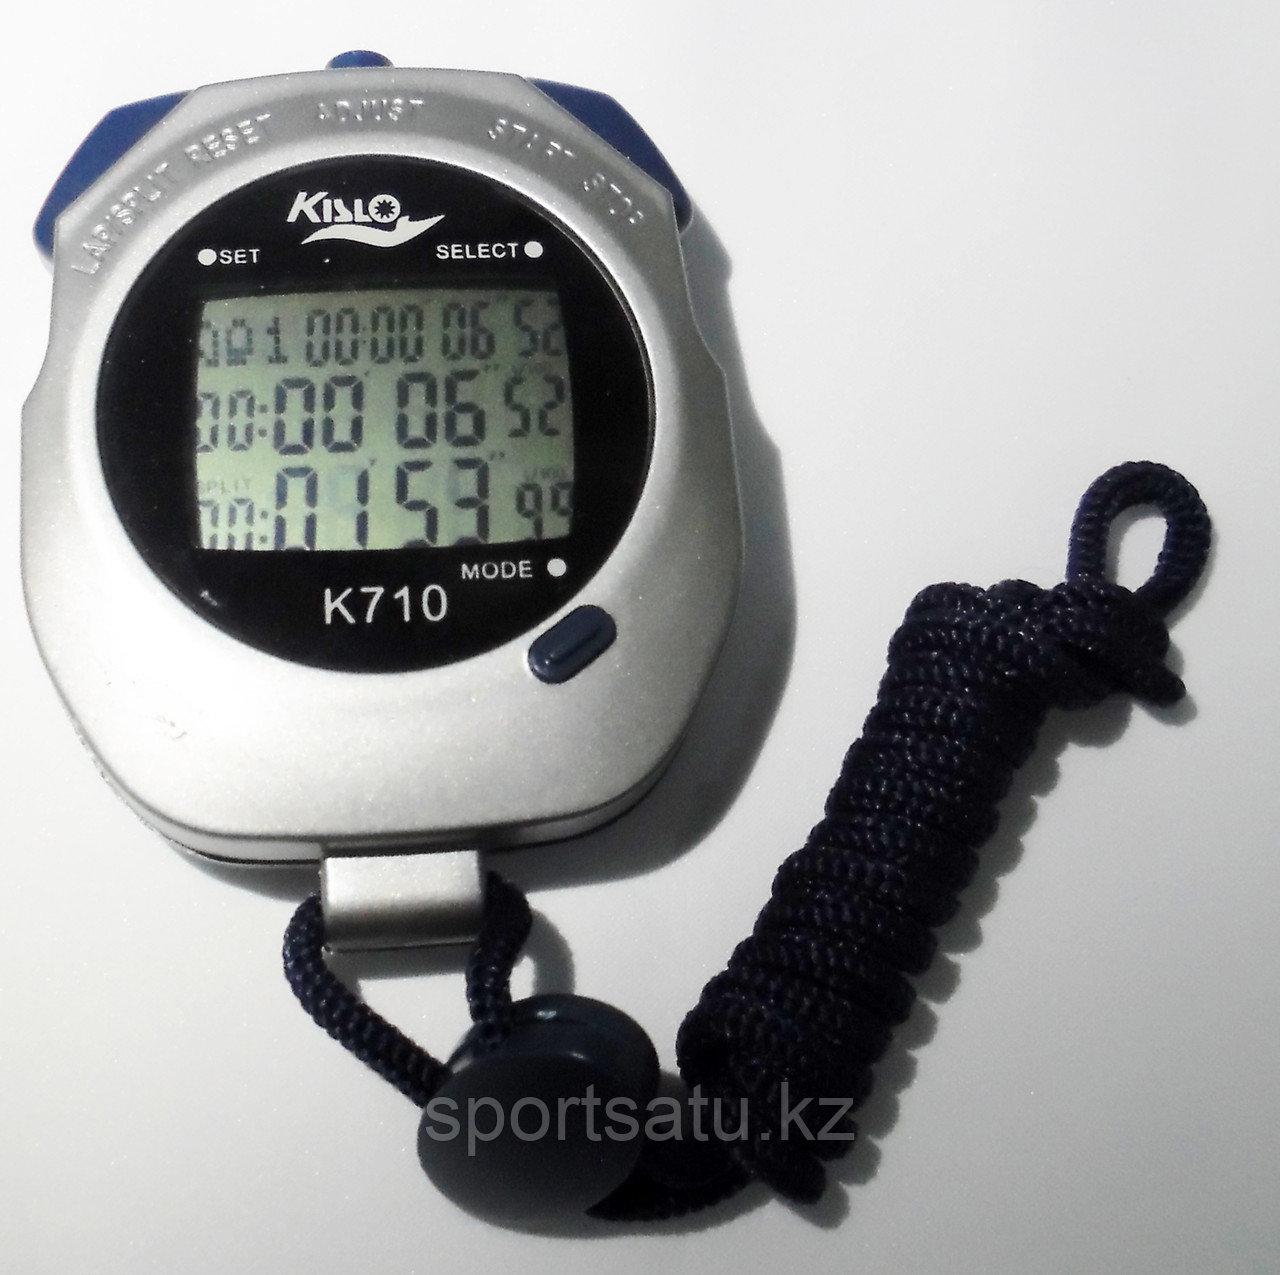 Секундомер KISLO K710